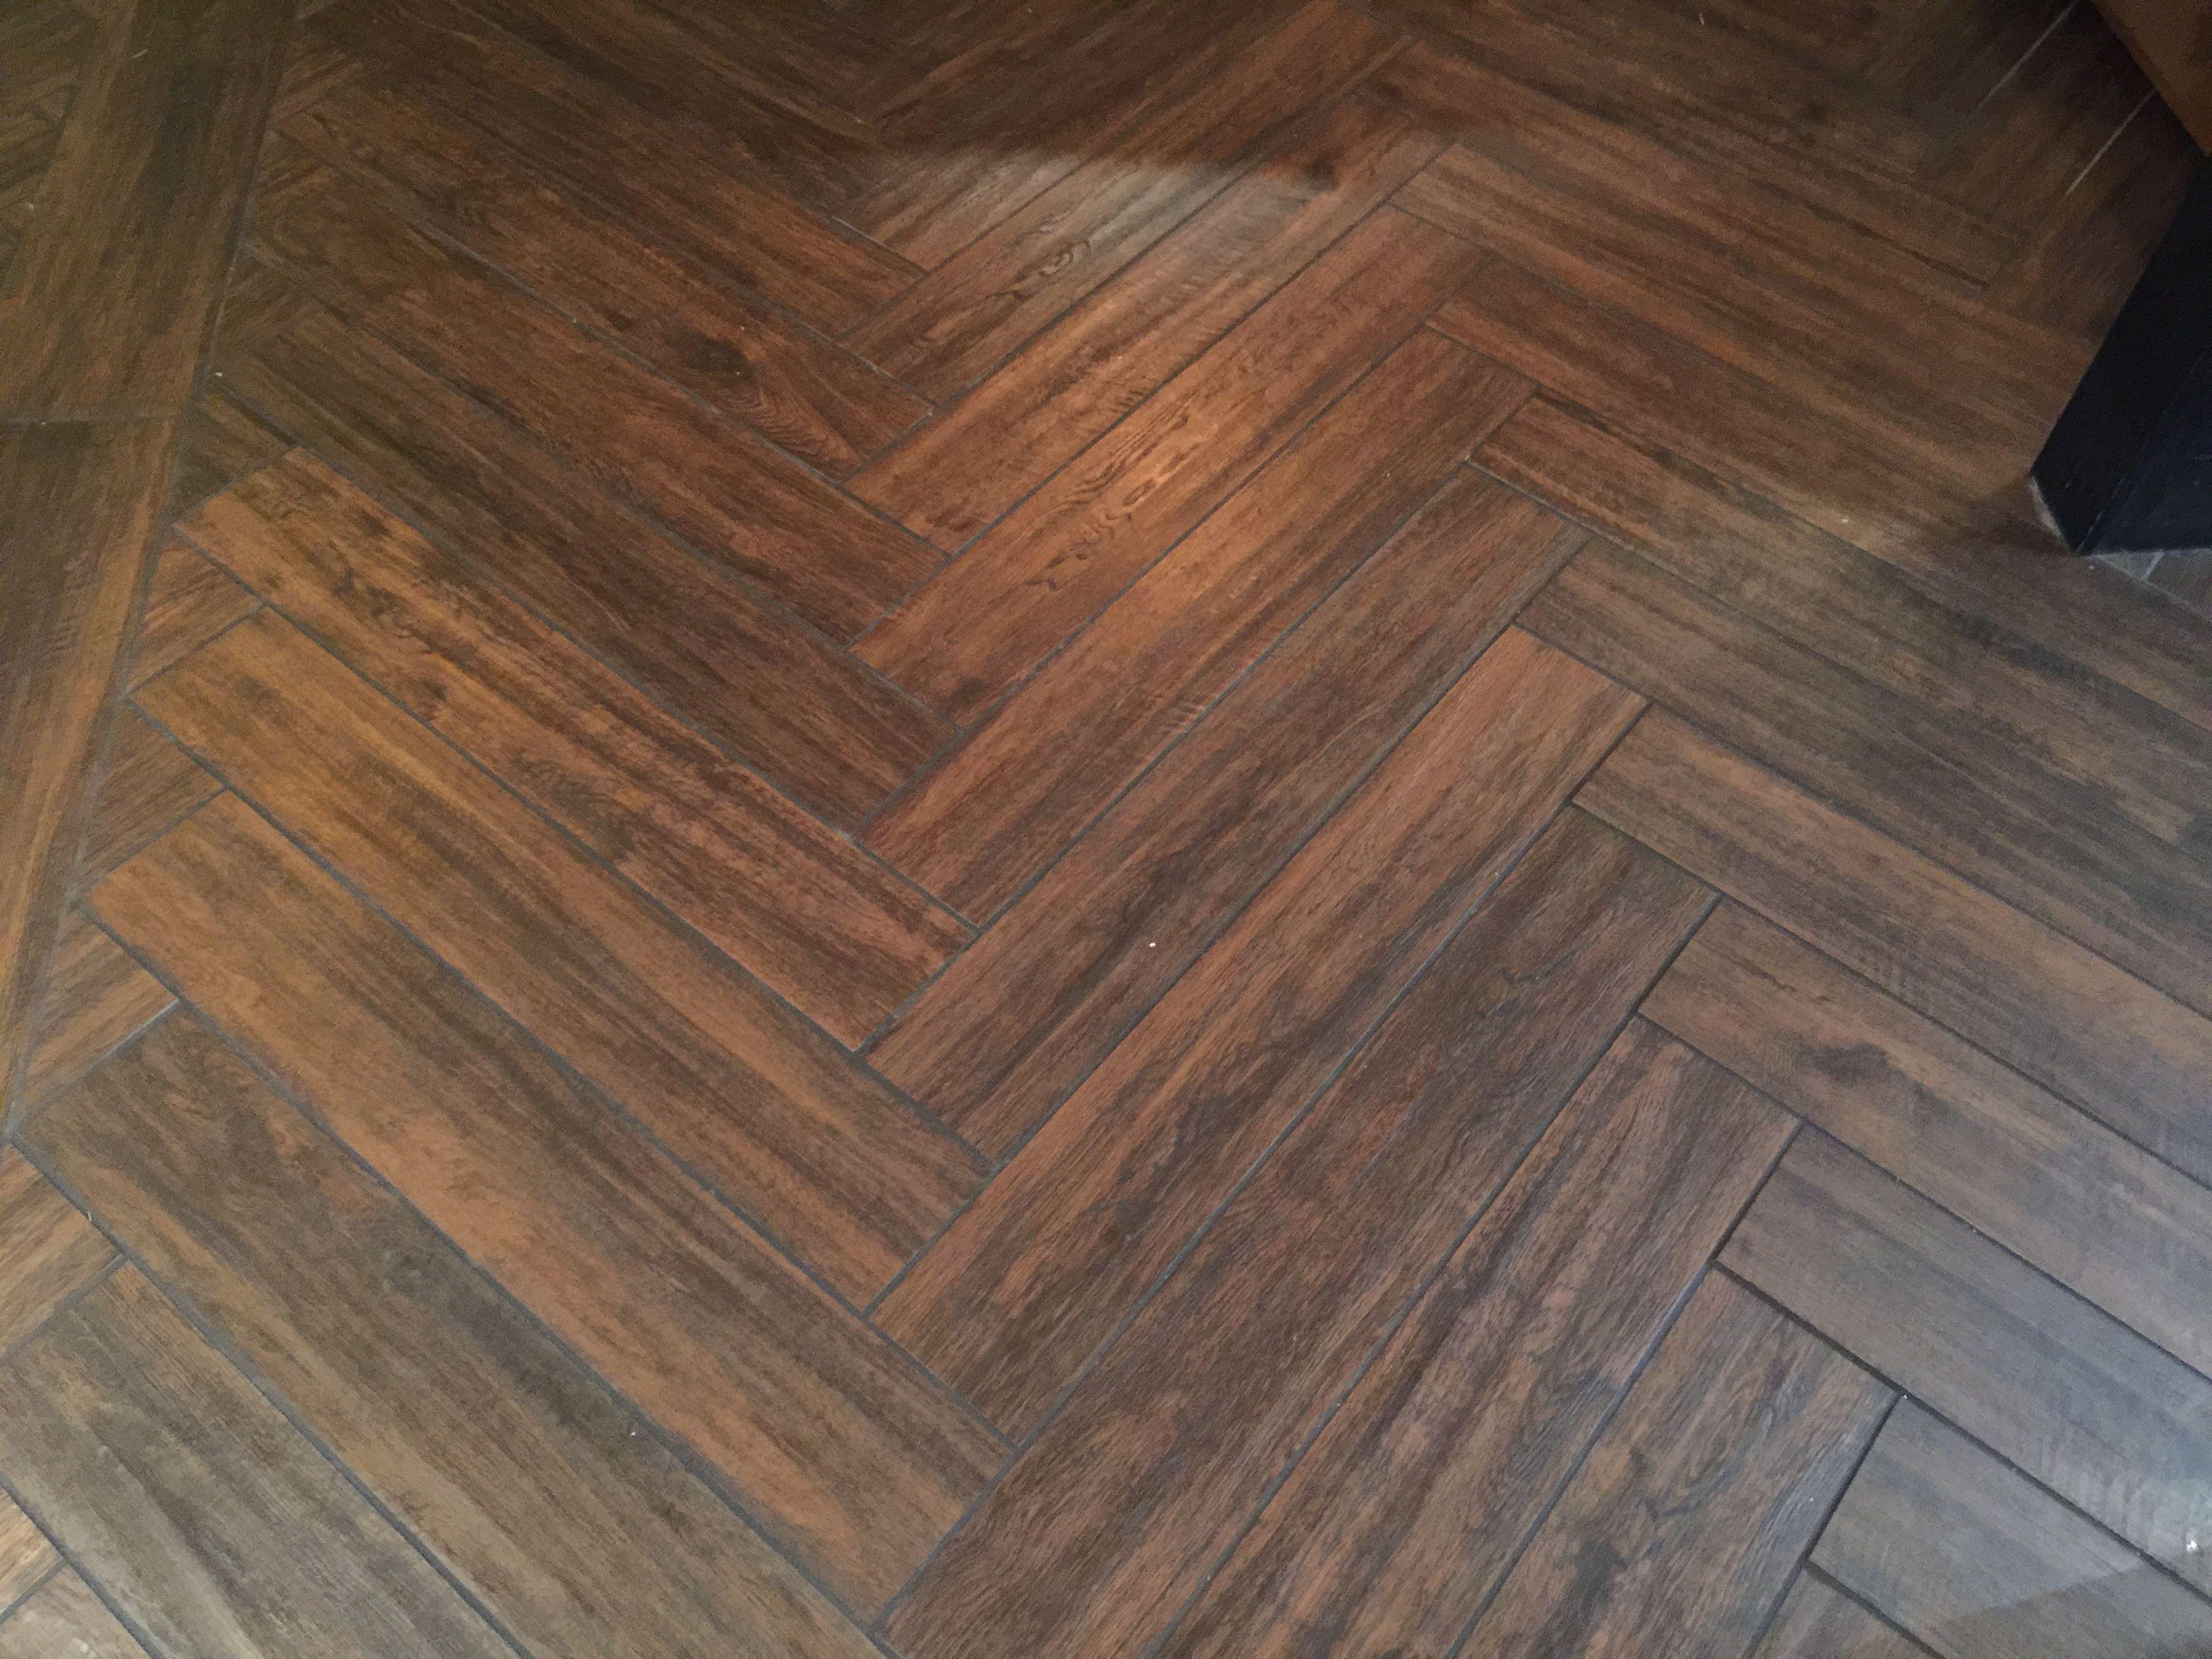 Herringbone tile pattern with 6x24 tiles Herringbone